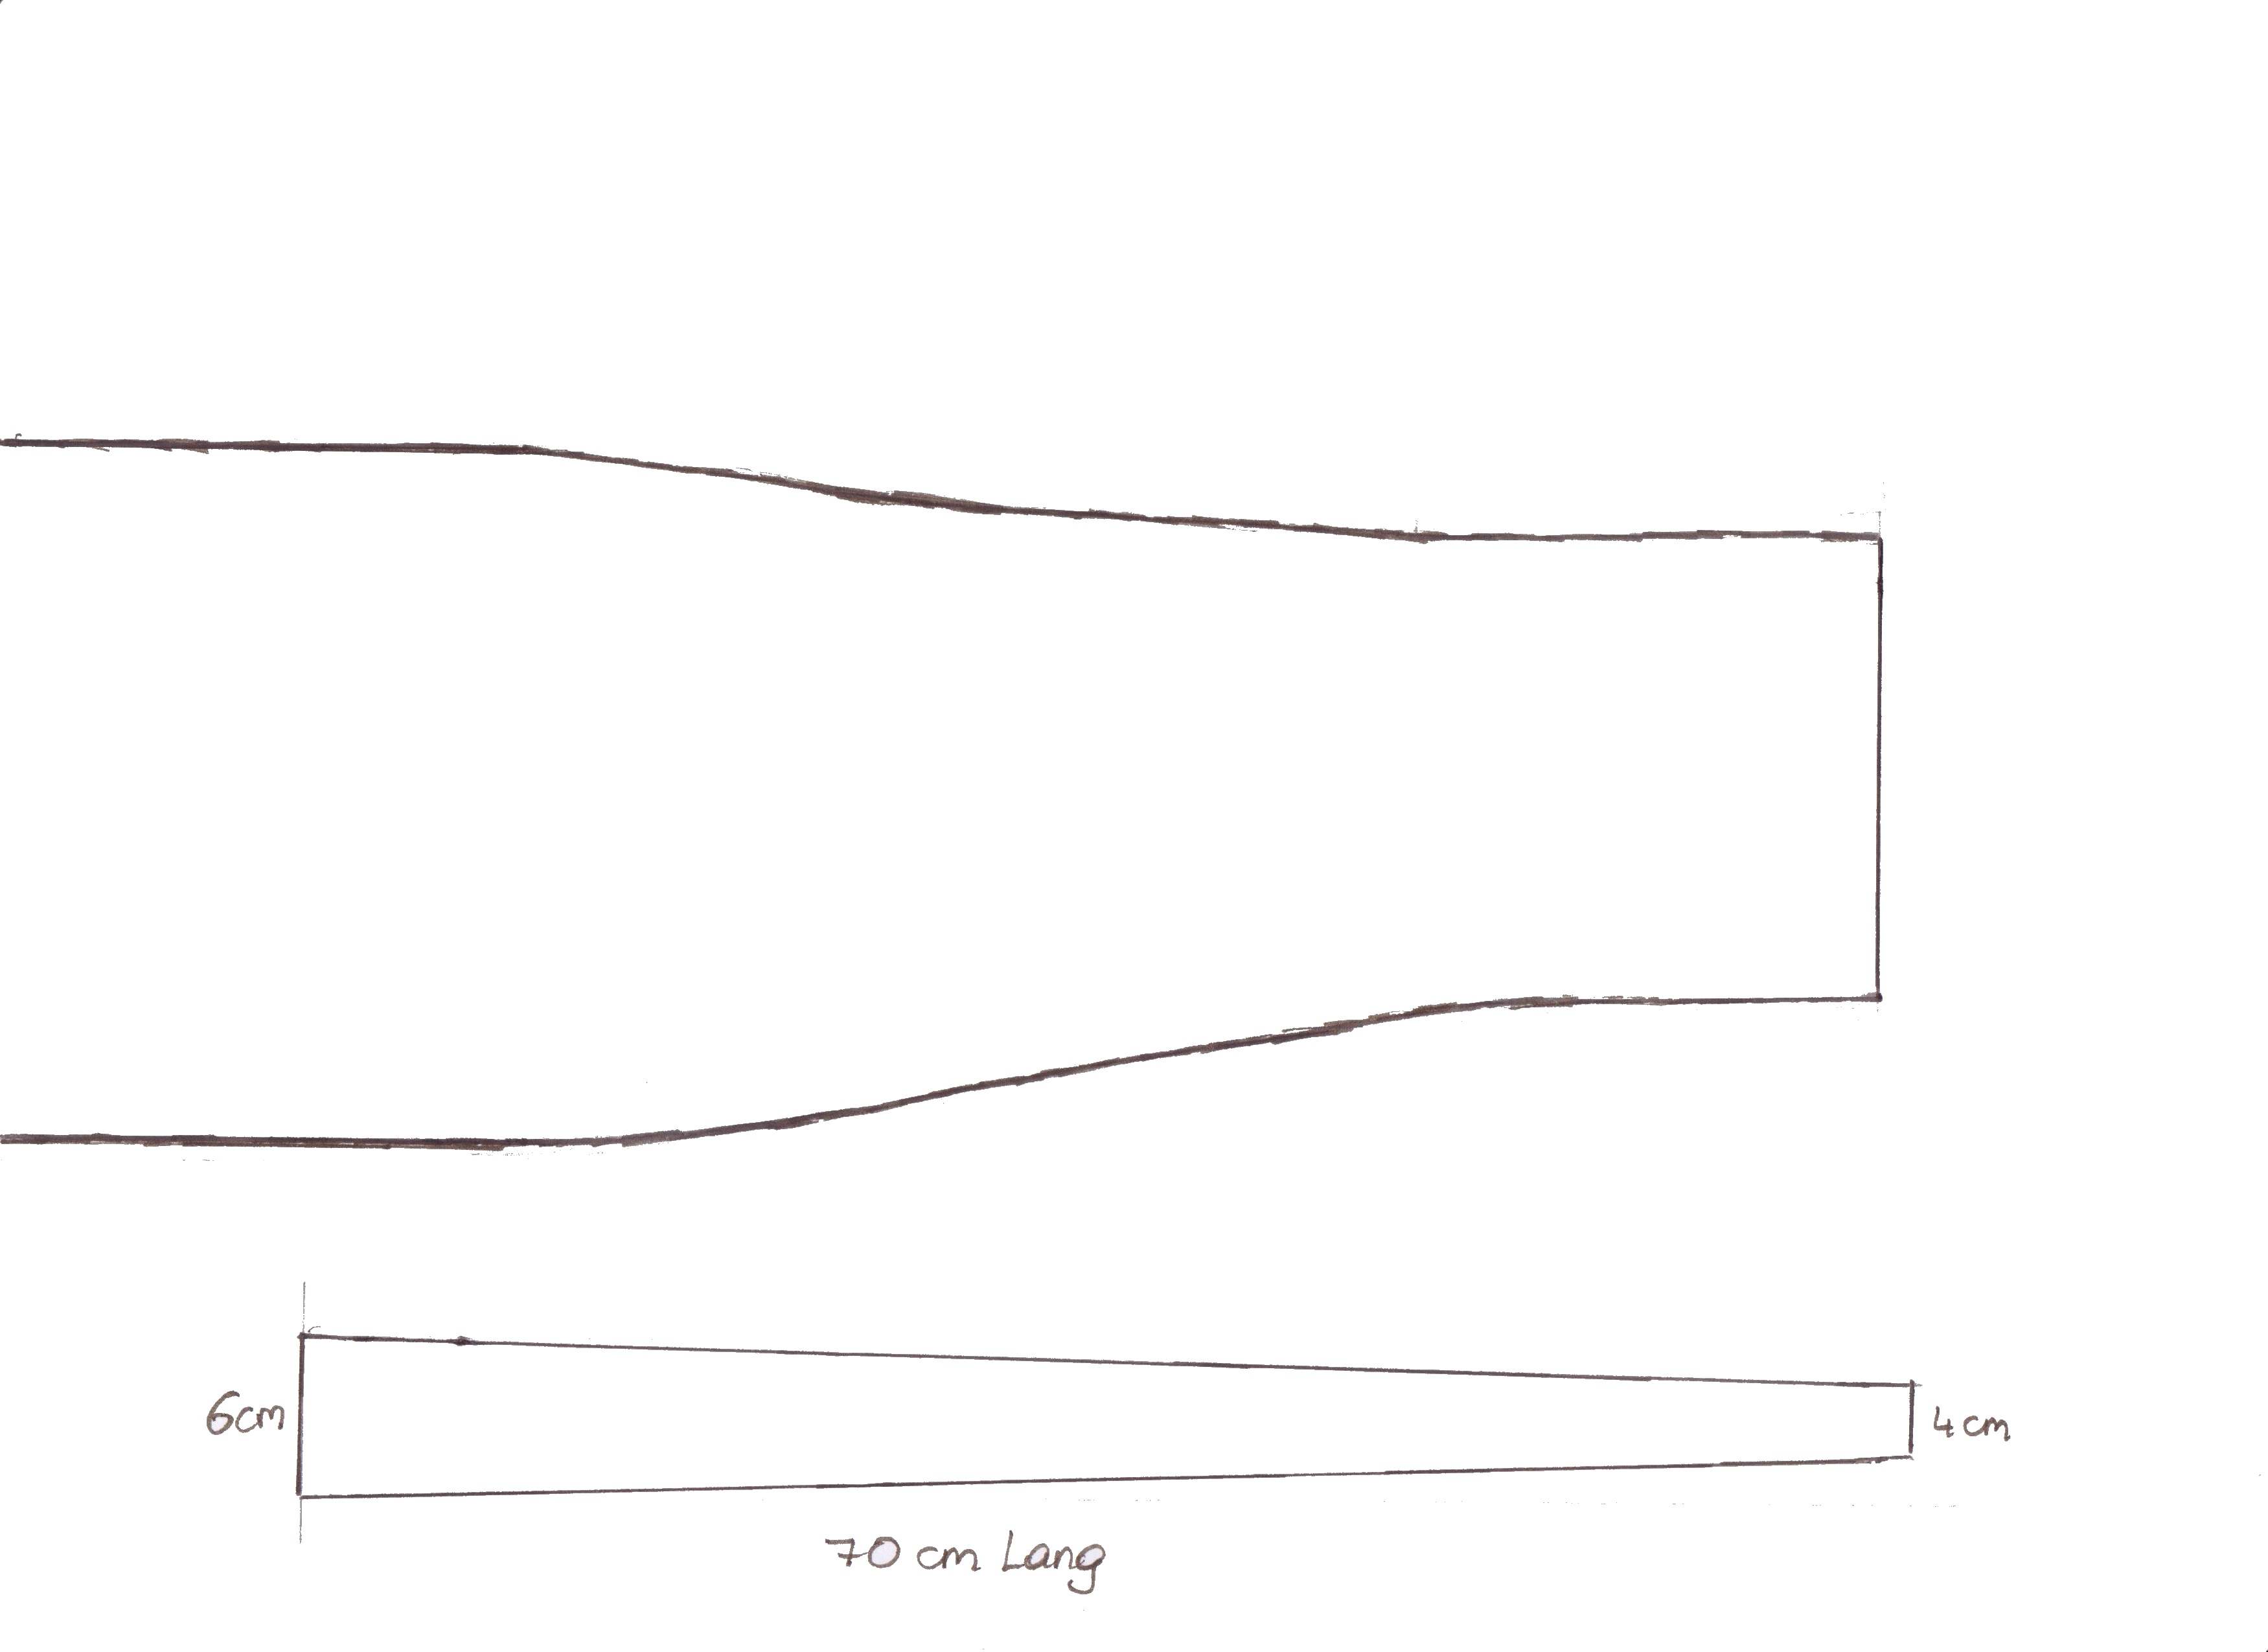 Ledergürtel selber nähen | DIY | ViennaFashionWaltz